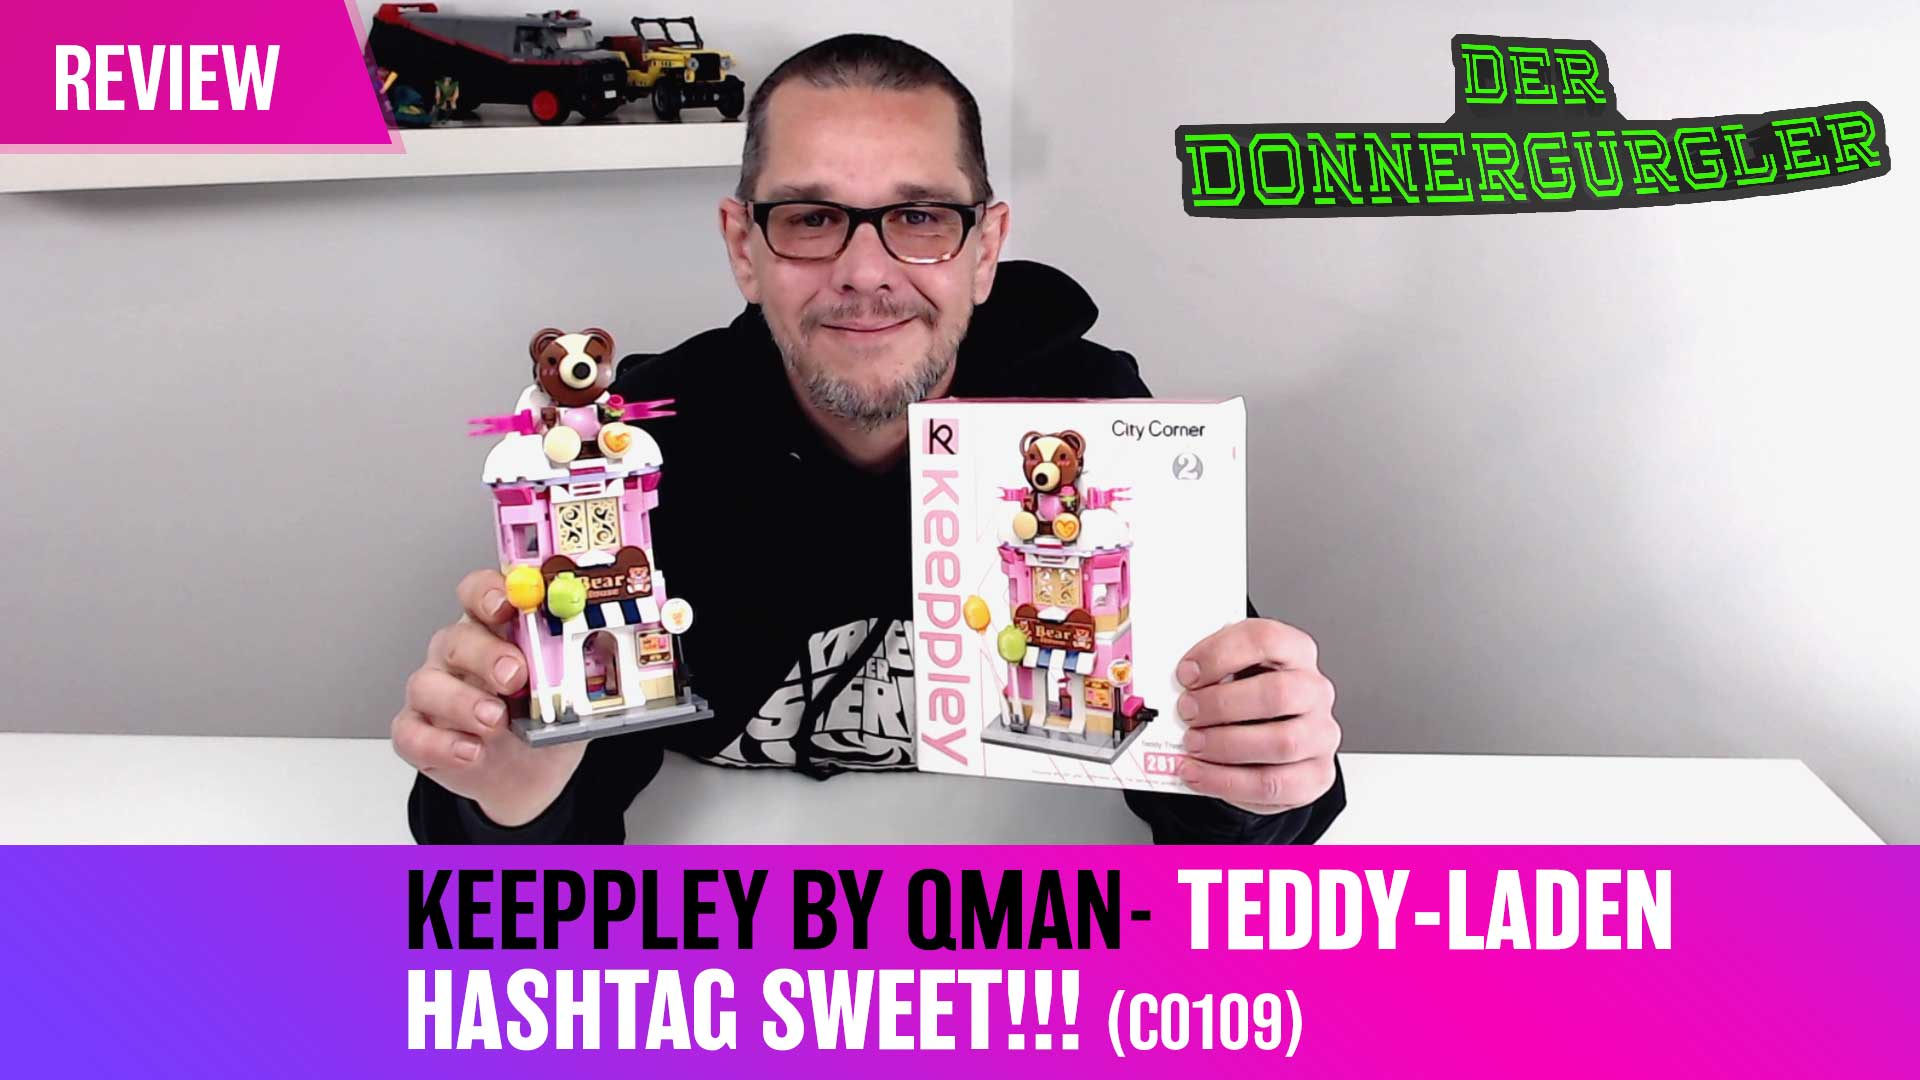 Keeppley by Qman - City Corner 2 - Der Teddy-Laden oder hashtag >SWEET<